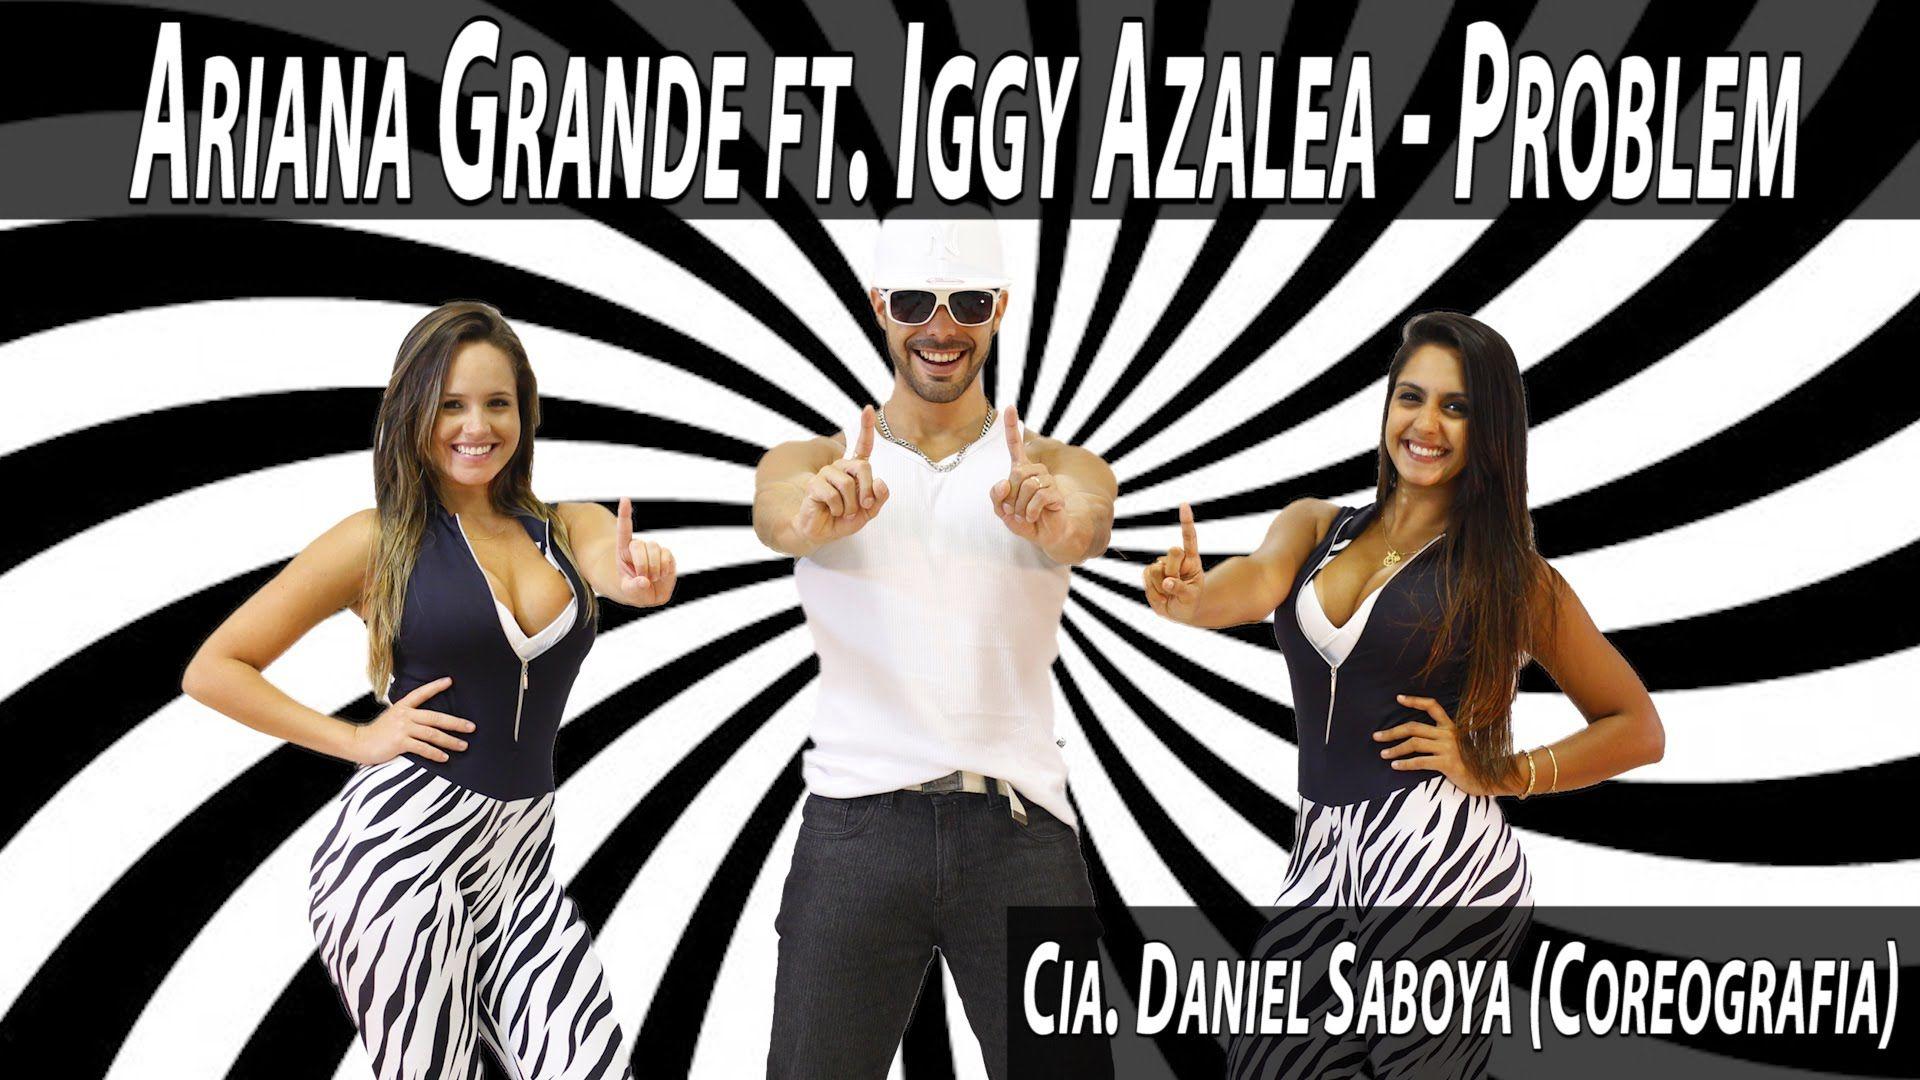 Ariana Grande Ft Iggy Azalea Problem Cia Daniel Saboya